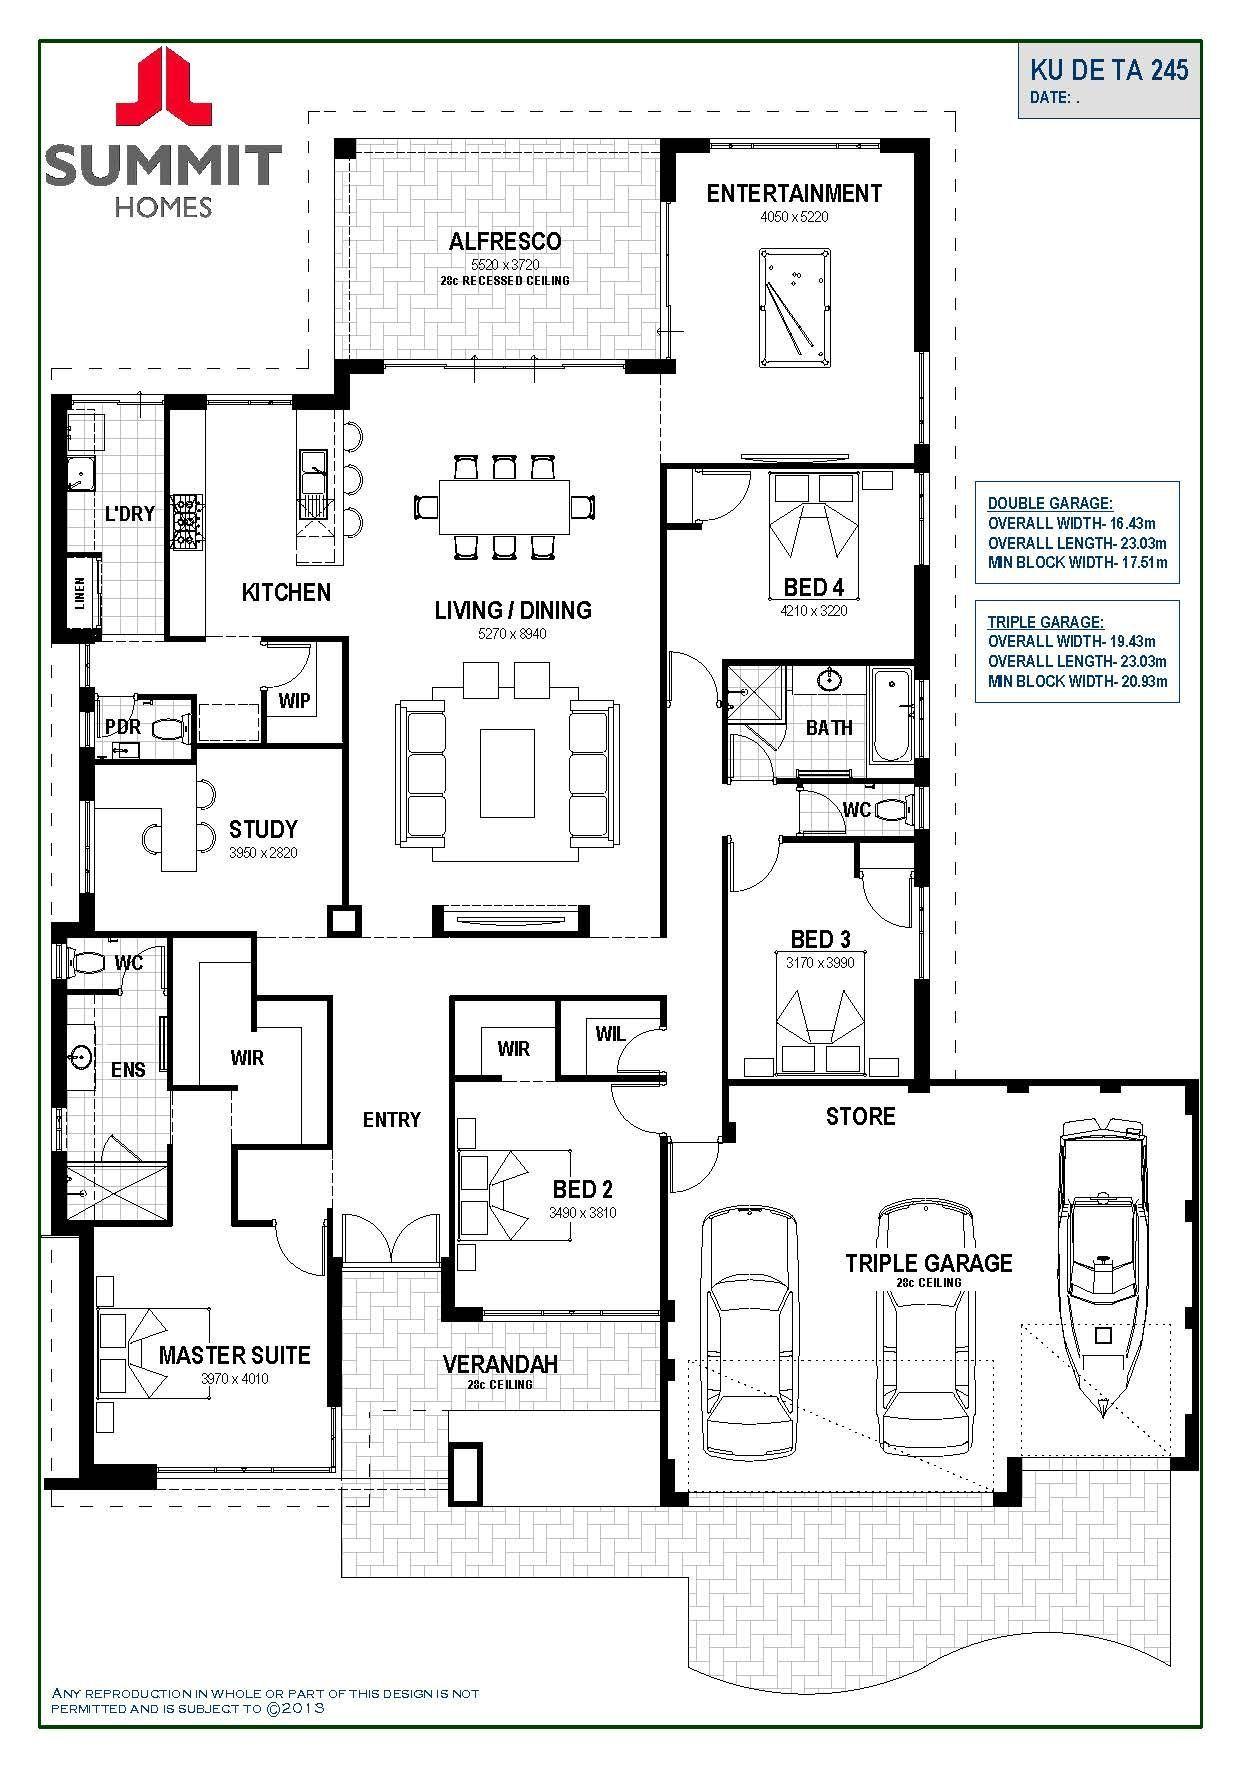 Ku De Ta 245 Single Storey Select Range Summit Homes Wa Ibuildnew House Plans Australia 4 Bedroom House Plans Floor Plan 4 Bedroom